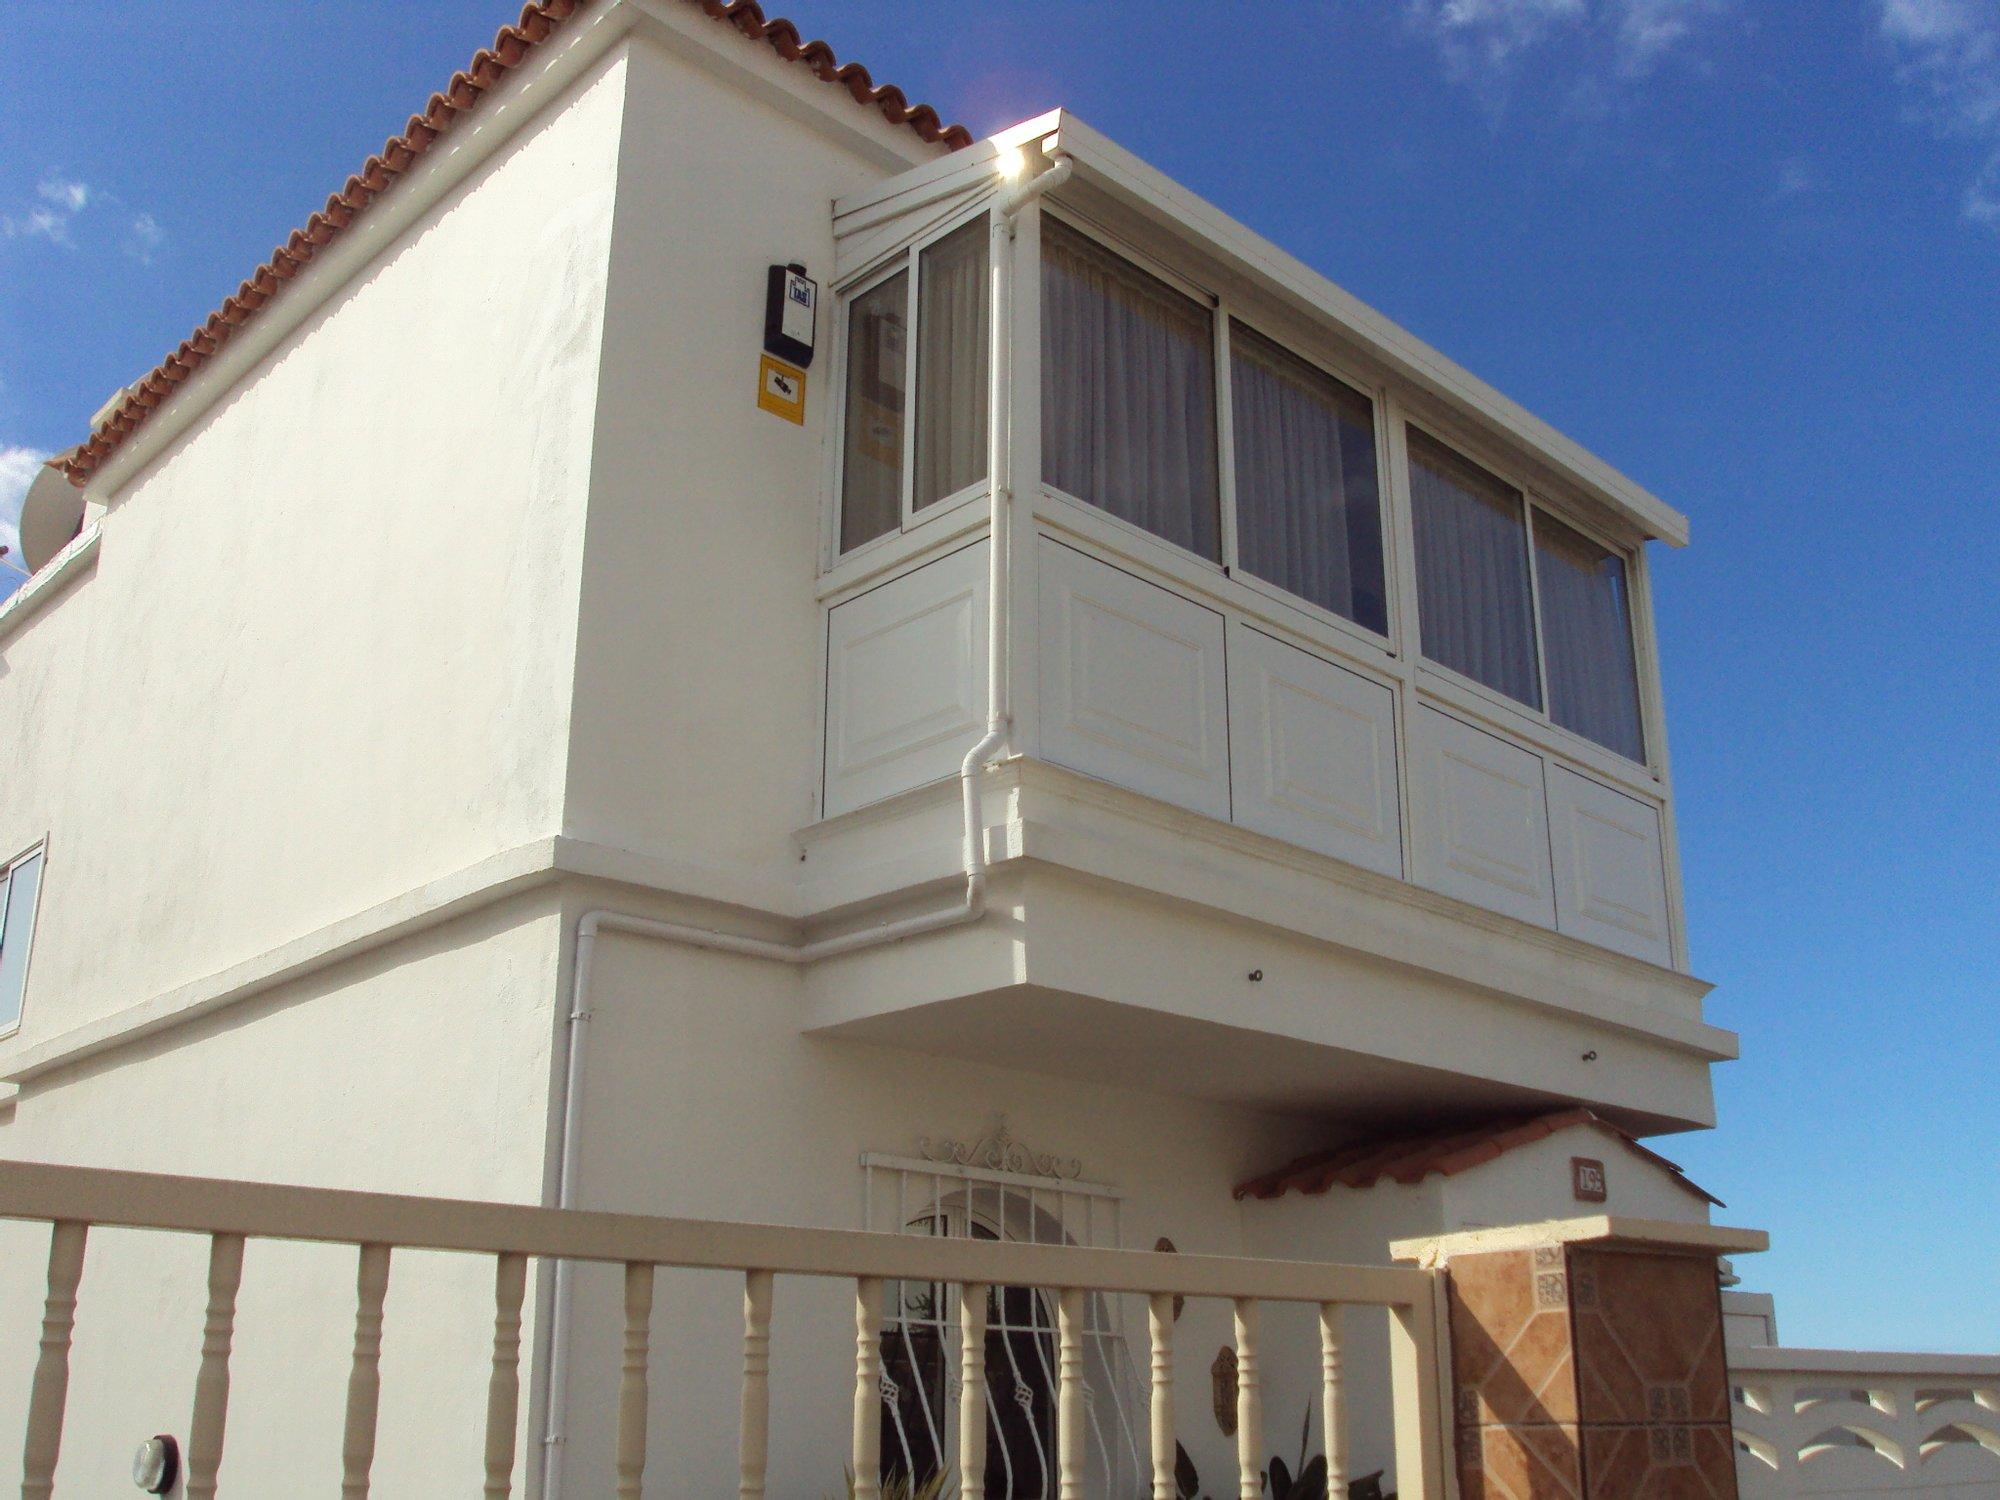 House in Valle de San Lorenzo, Canary Islands, Spain 1